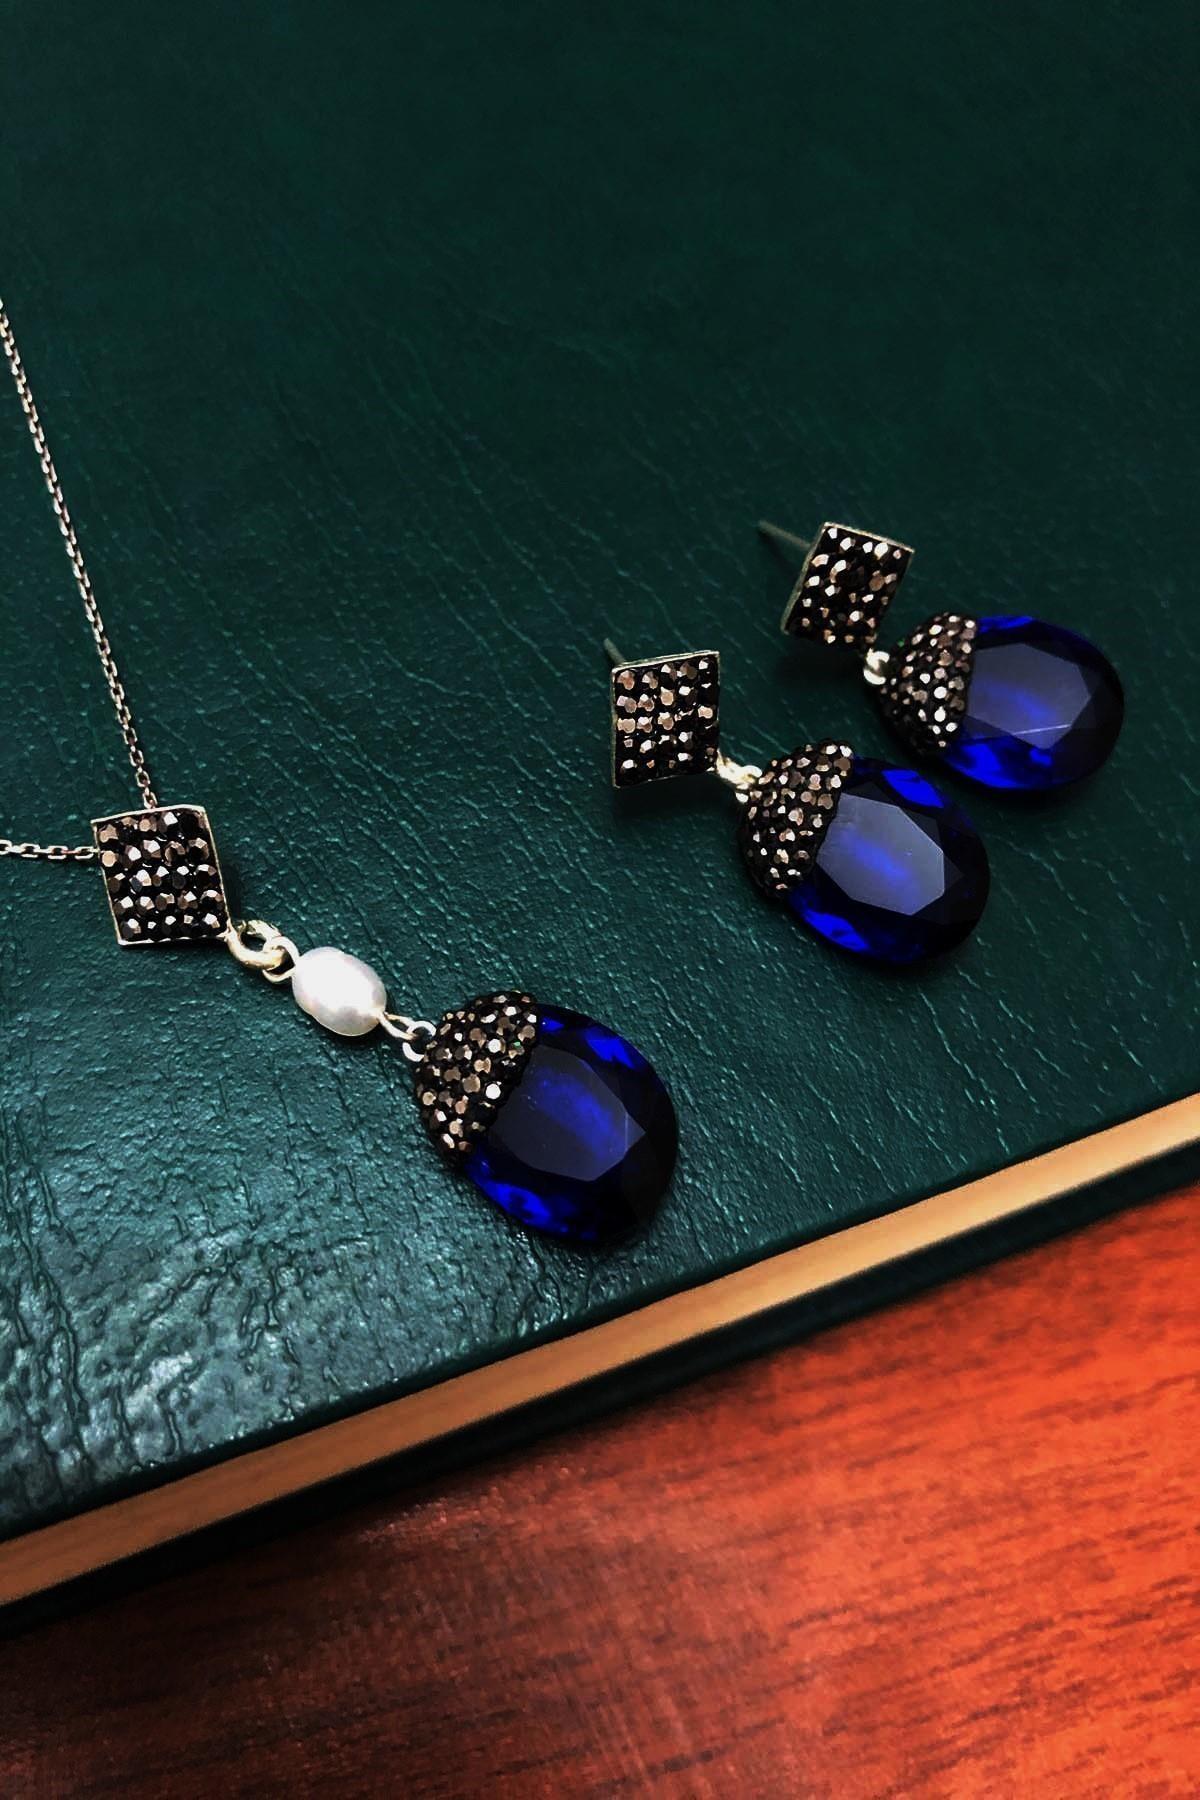 Dr. Stone Safir Rengi Hindistan Kristali Ve Inci Gümüş Kadın Set Xdrsott6 1